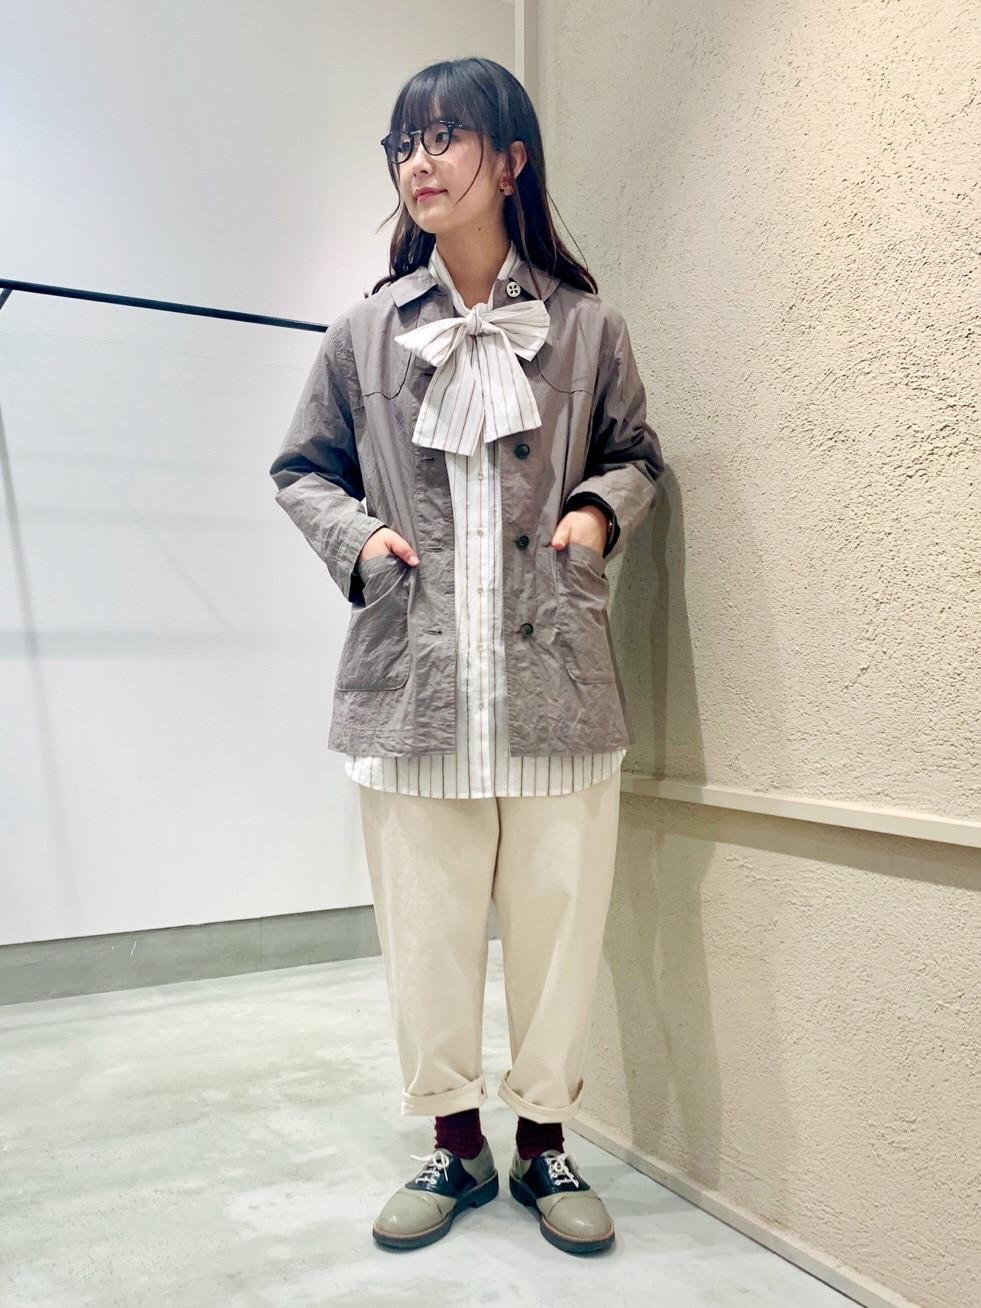 chambre de charme 横浜ジョイナス 身長:162cm 2021.02.04